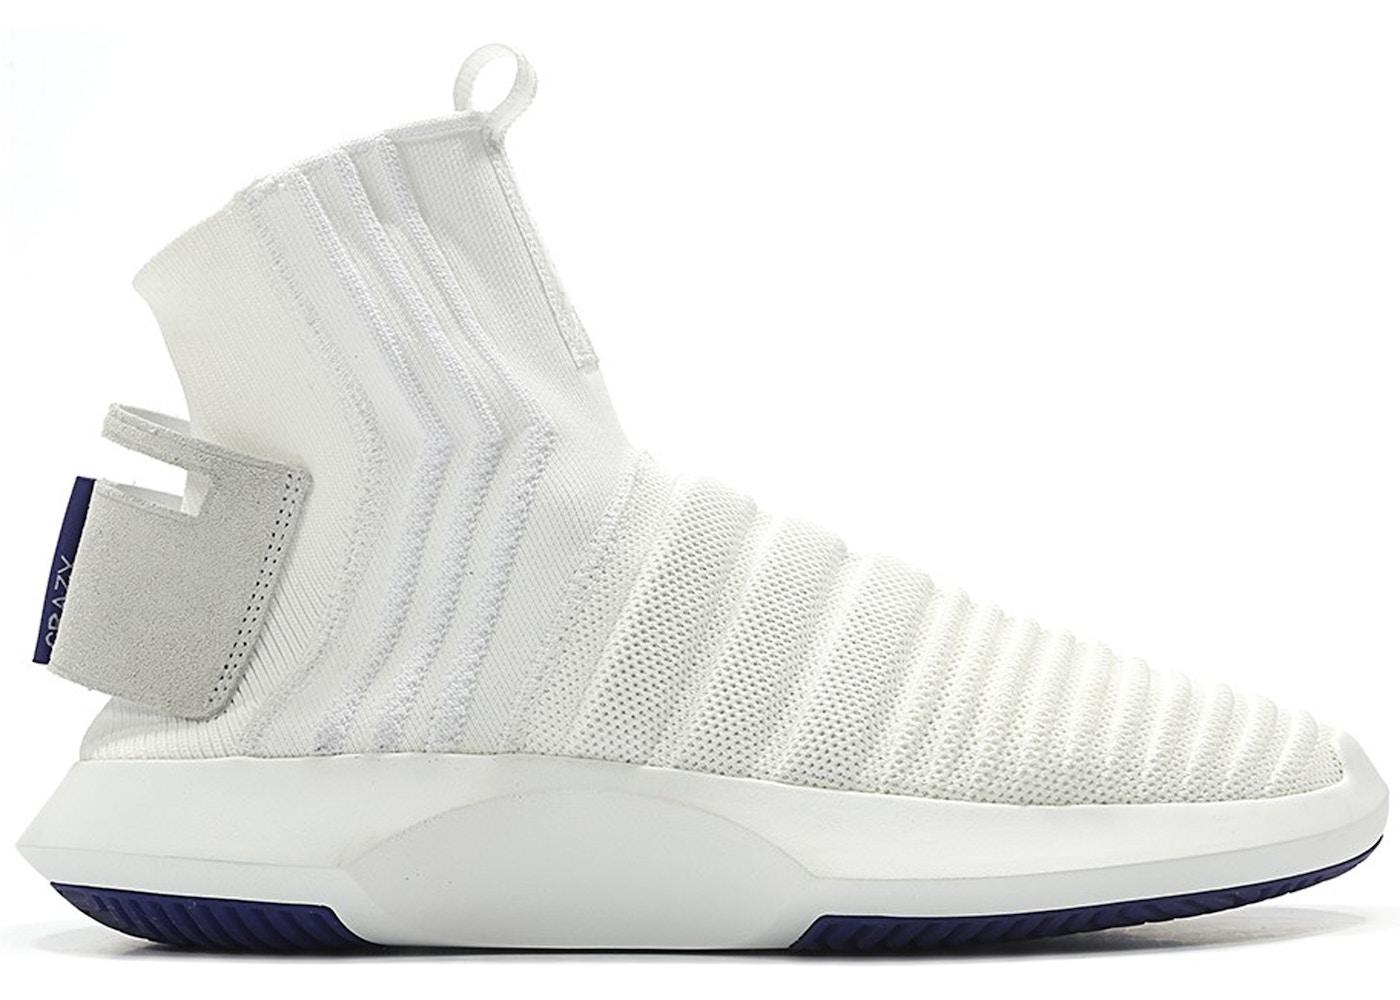 new concept e7062 2a058 adidas Crazy 1 Adv Sock Footwear White Real Purple